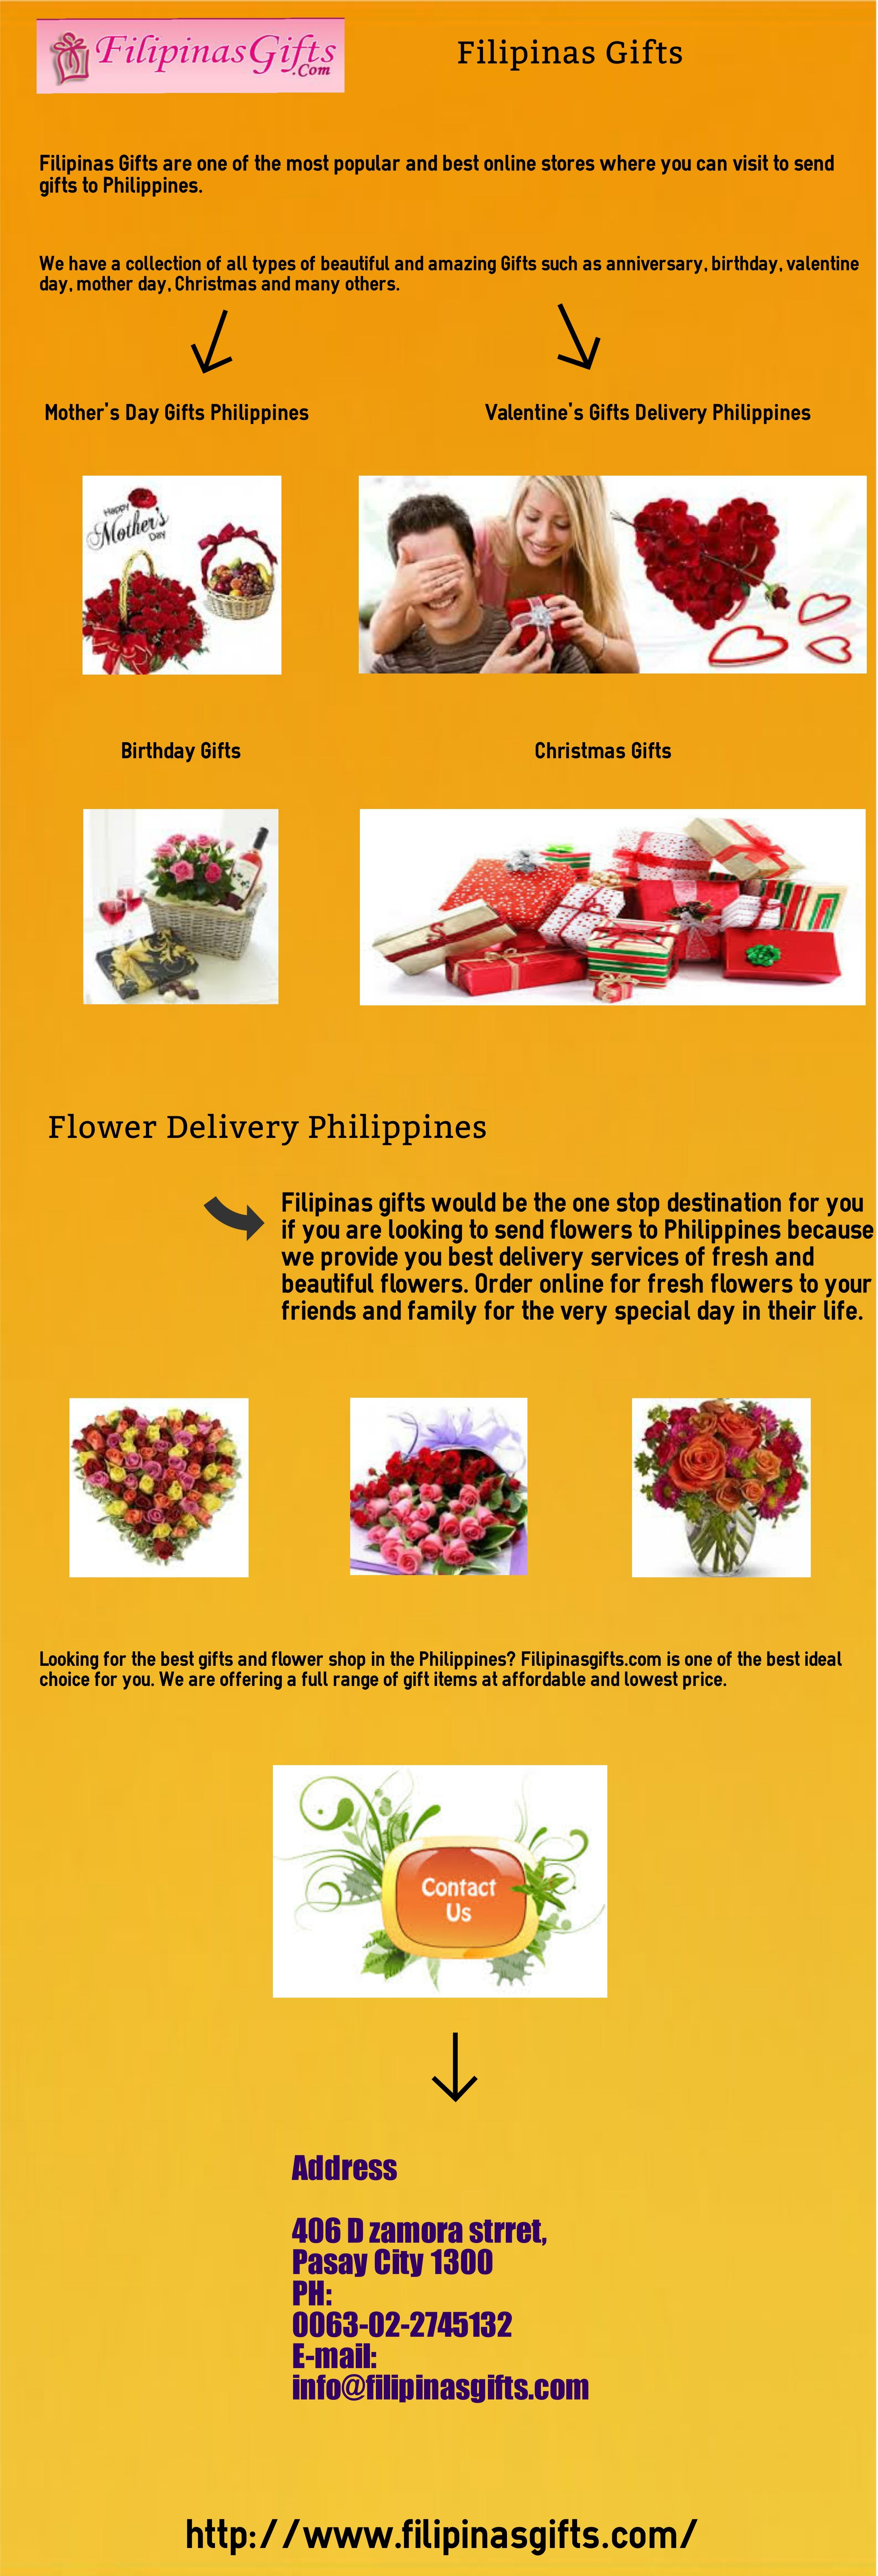 Filipinas gifts send gifts to philippines filipinas